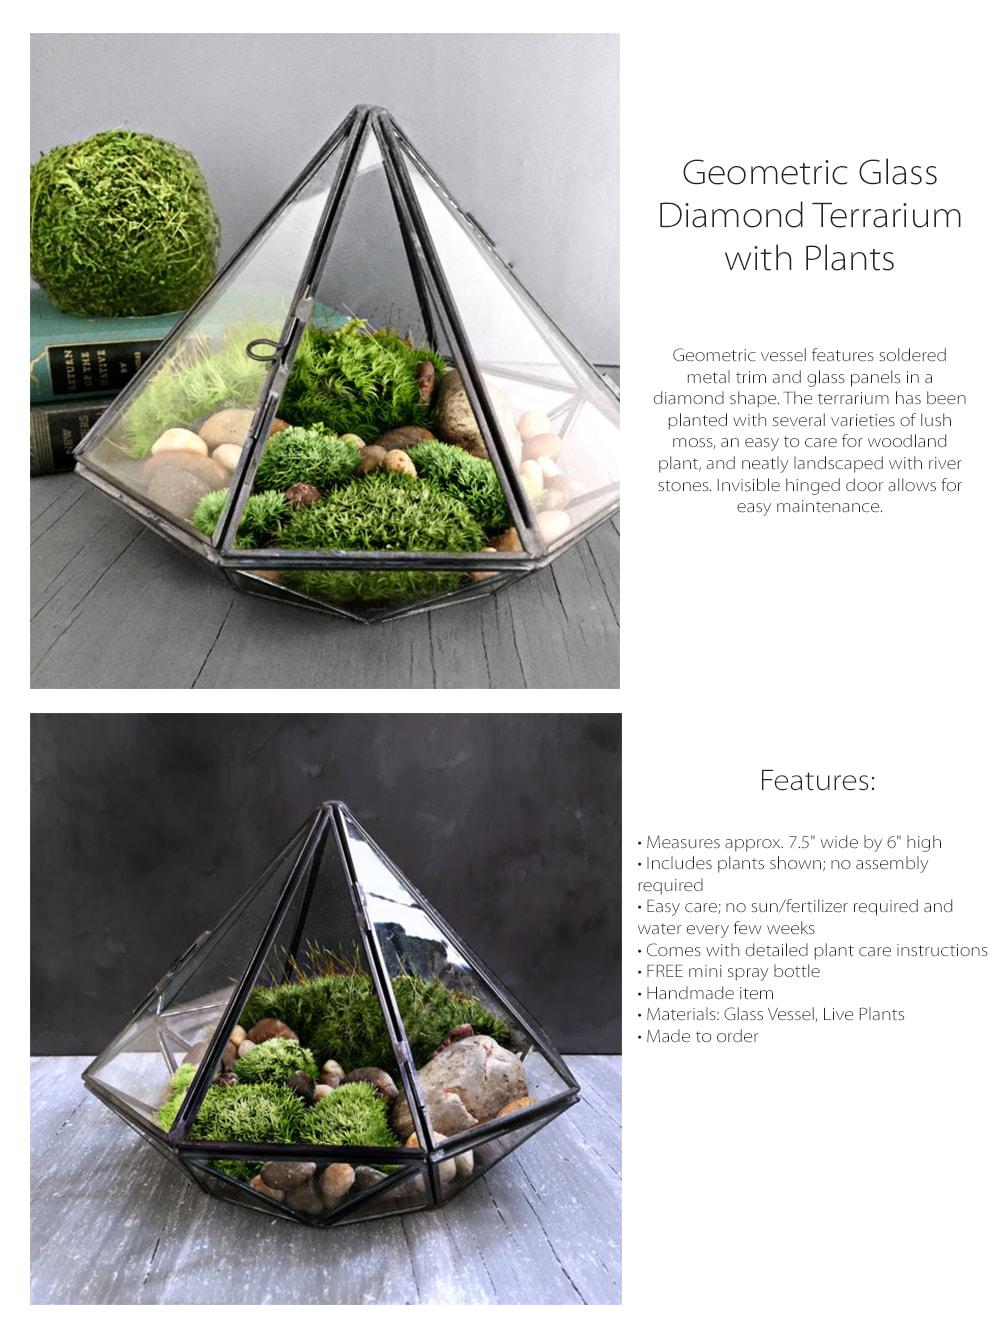 Geometric Glass Diamond Terrarium with Plants Miniature Landscape Garden